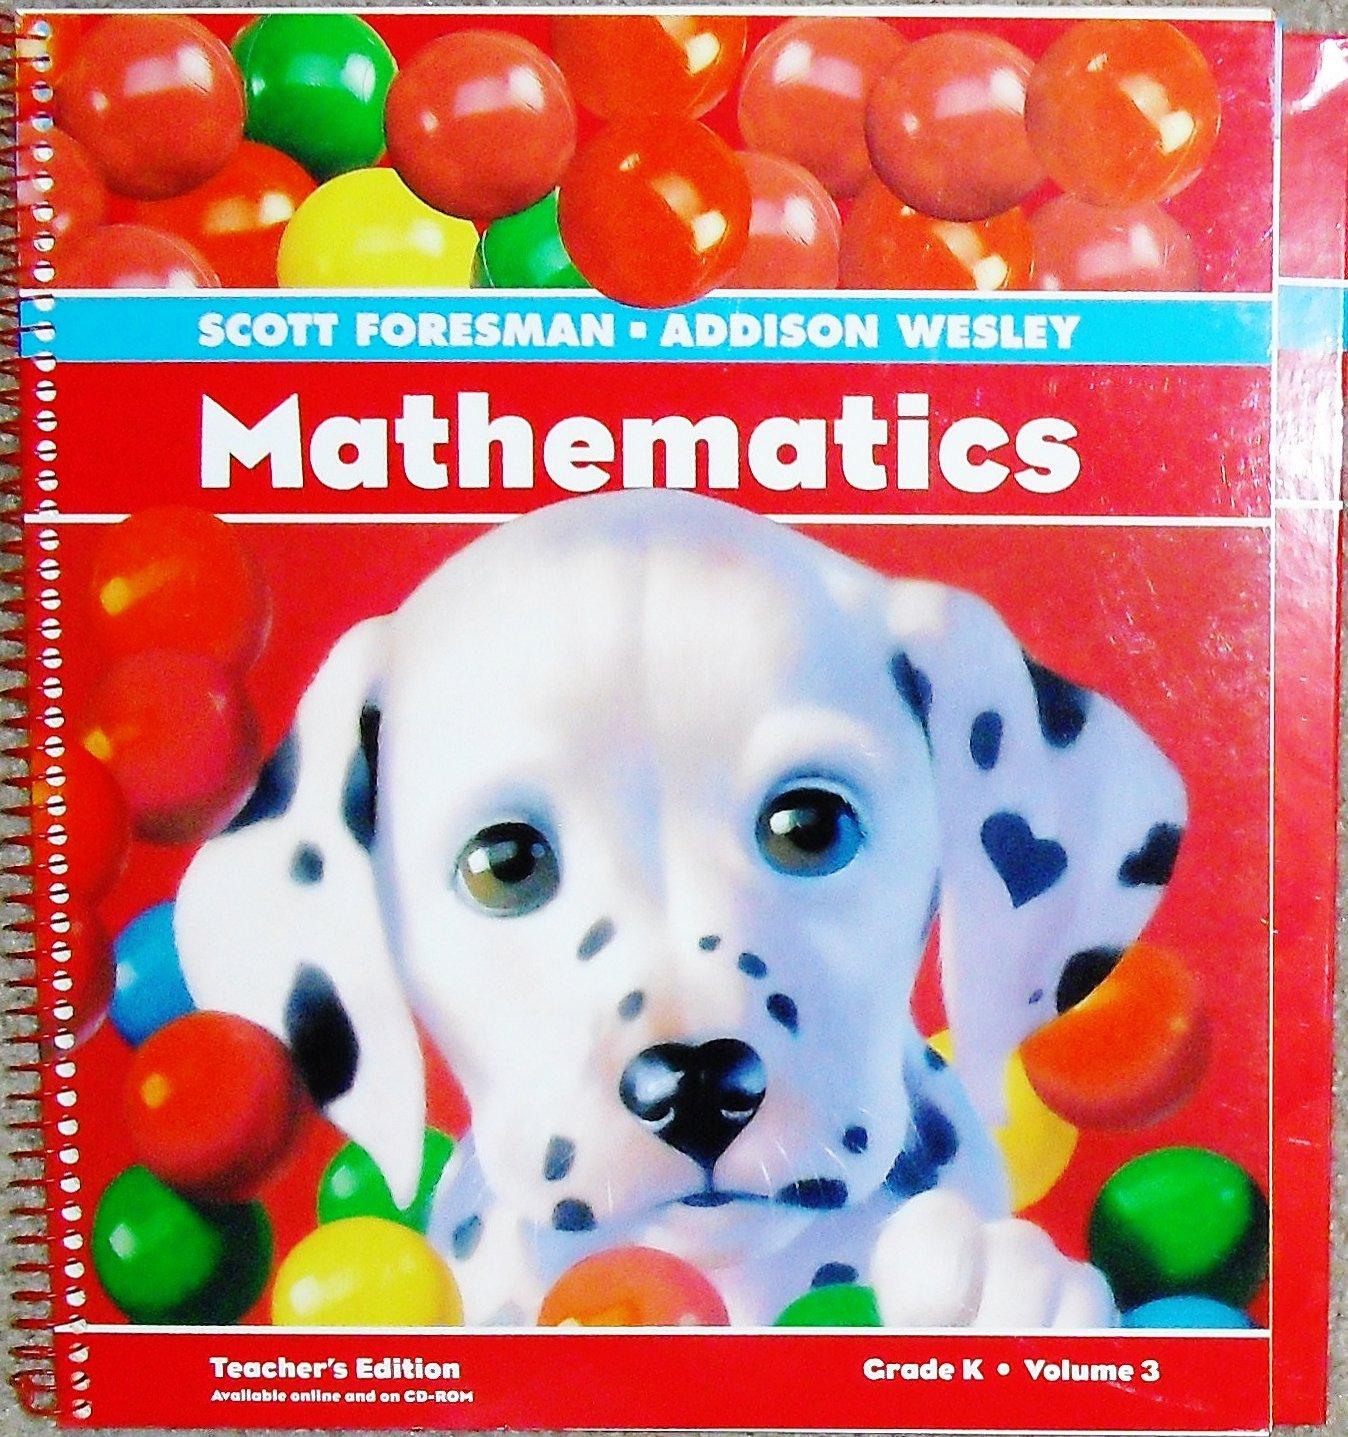 Download Scott Foresman Mathematics, Teacher's Edition, Grade K, Volume 3 (3) pdf epub